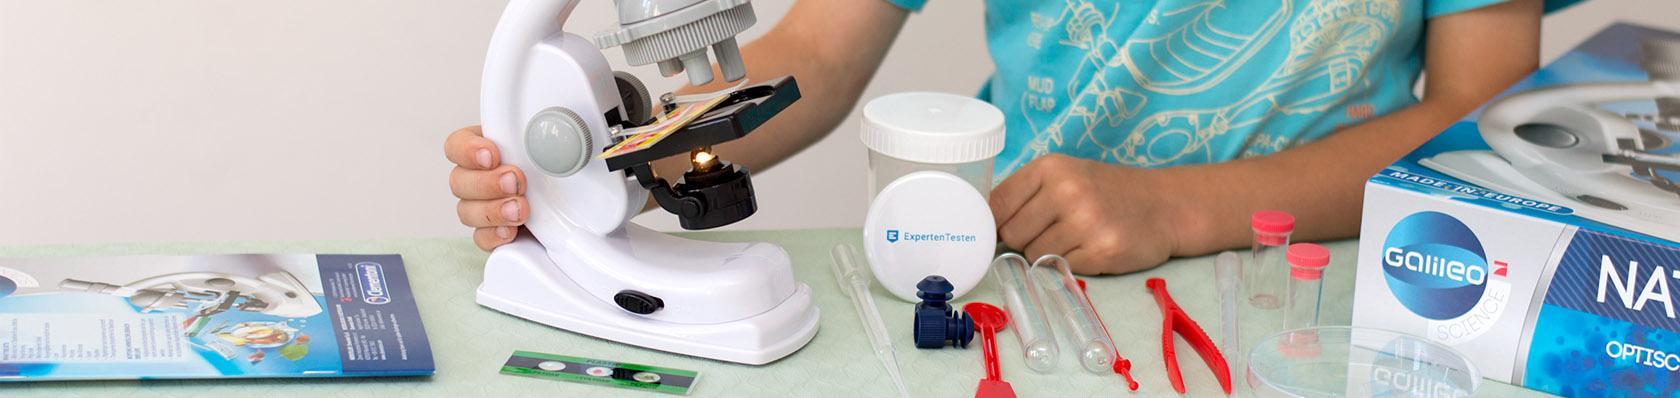 Mikroskope im Test auf ExpertenTesten.de